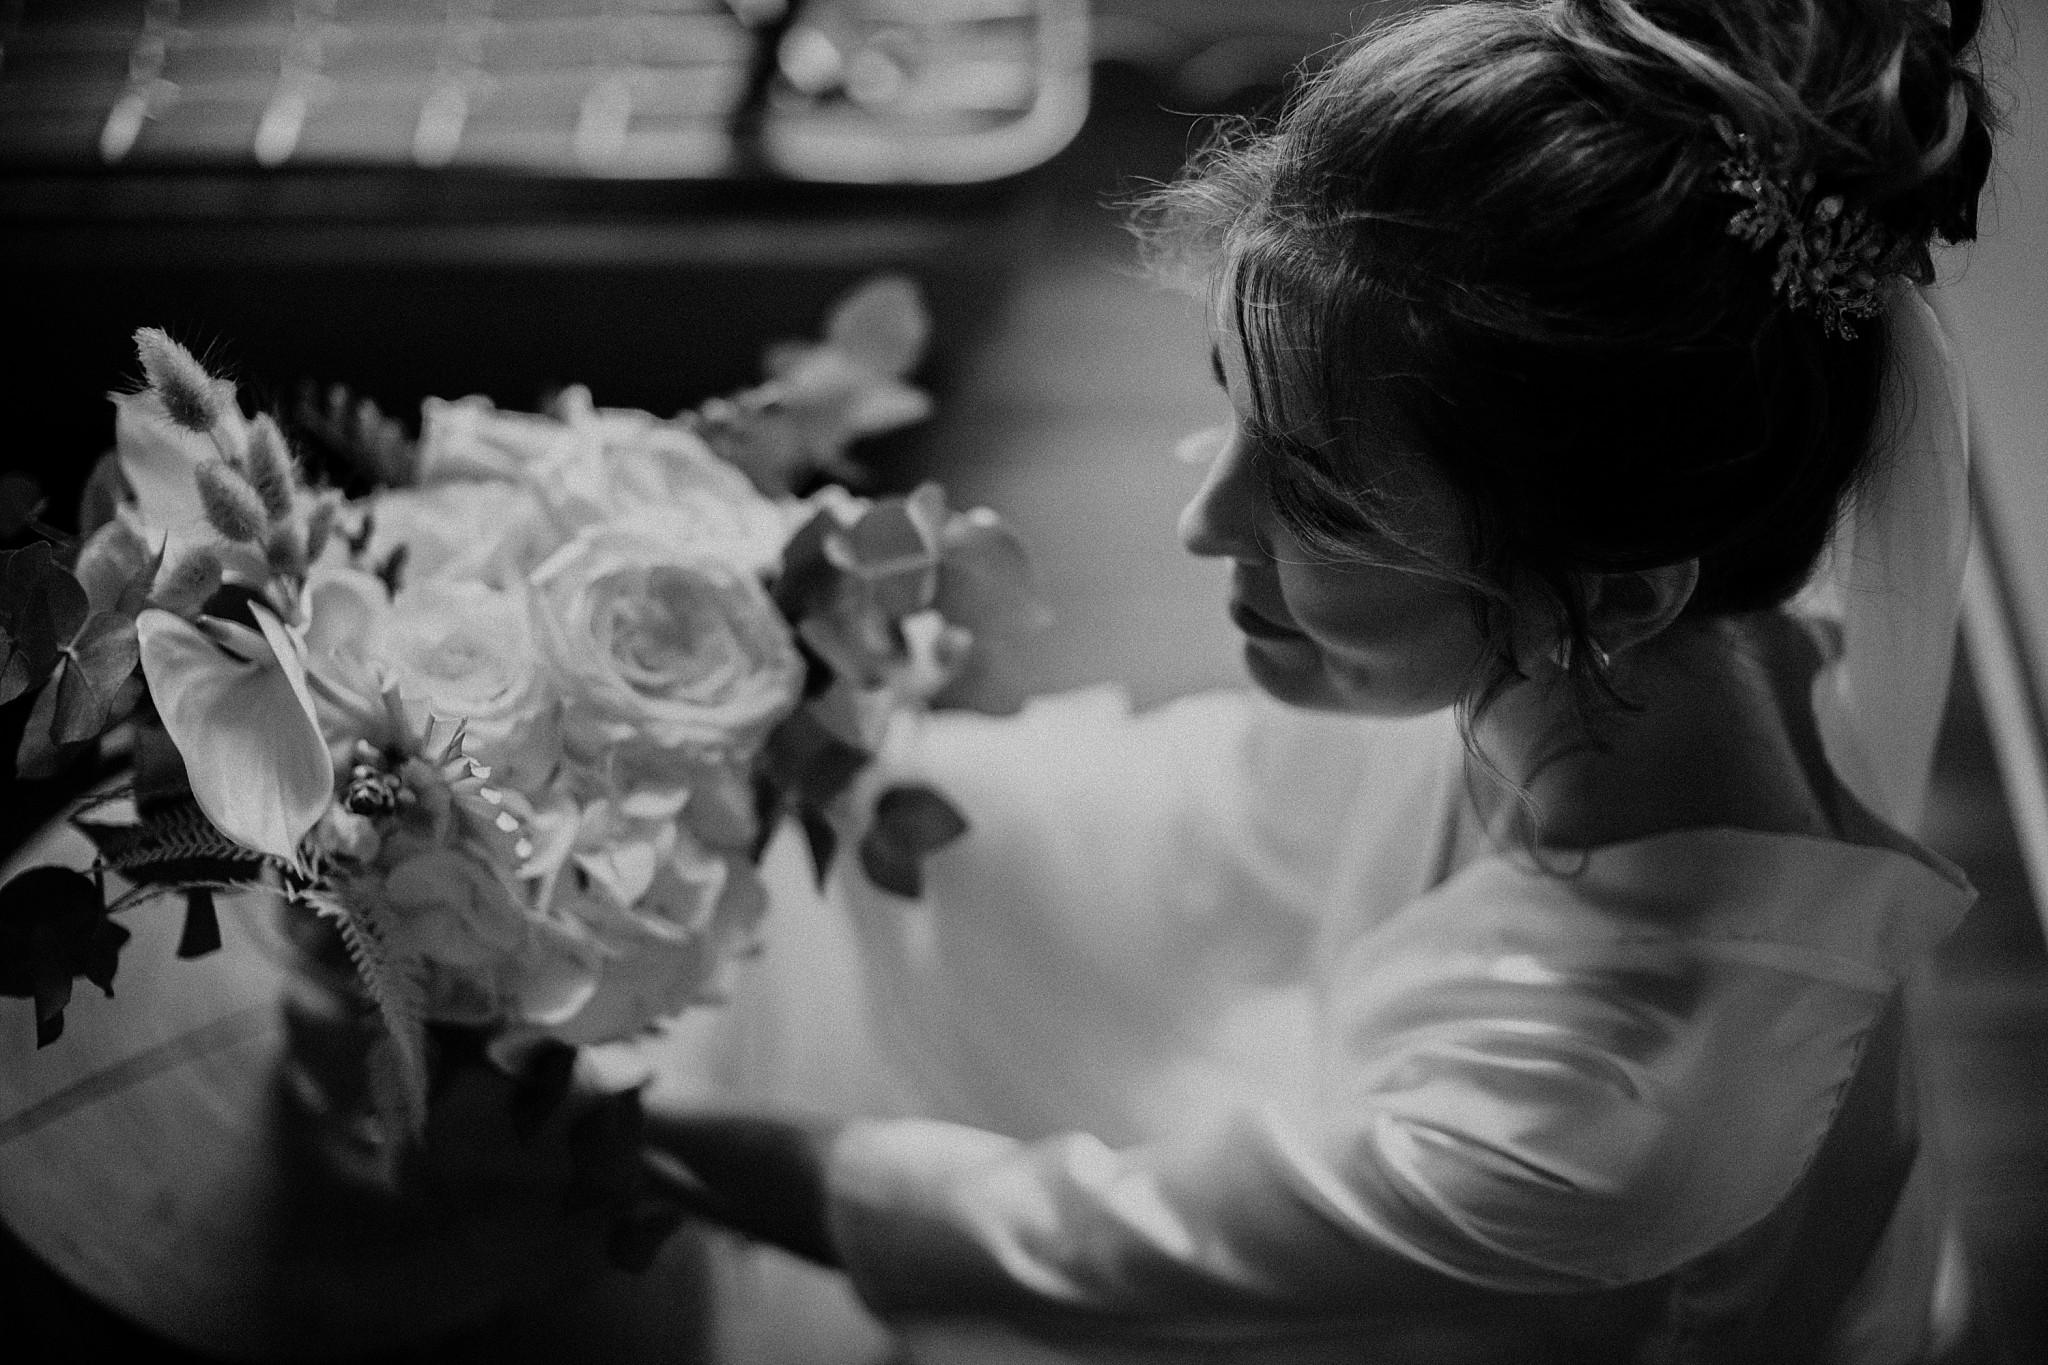 fotograf poznan wesele dobra truskawka piekne wesele pod poznaniem wesele w dobrej truskawce piekna para mloda slub marzen slub koronawirus slub listopad wesele koronawirus 038